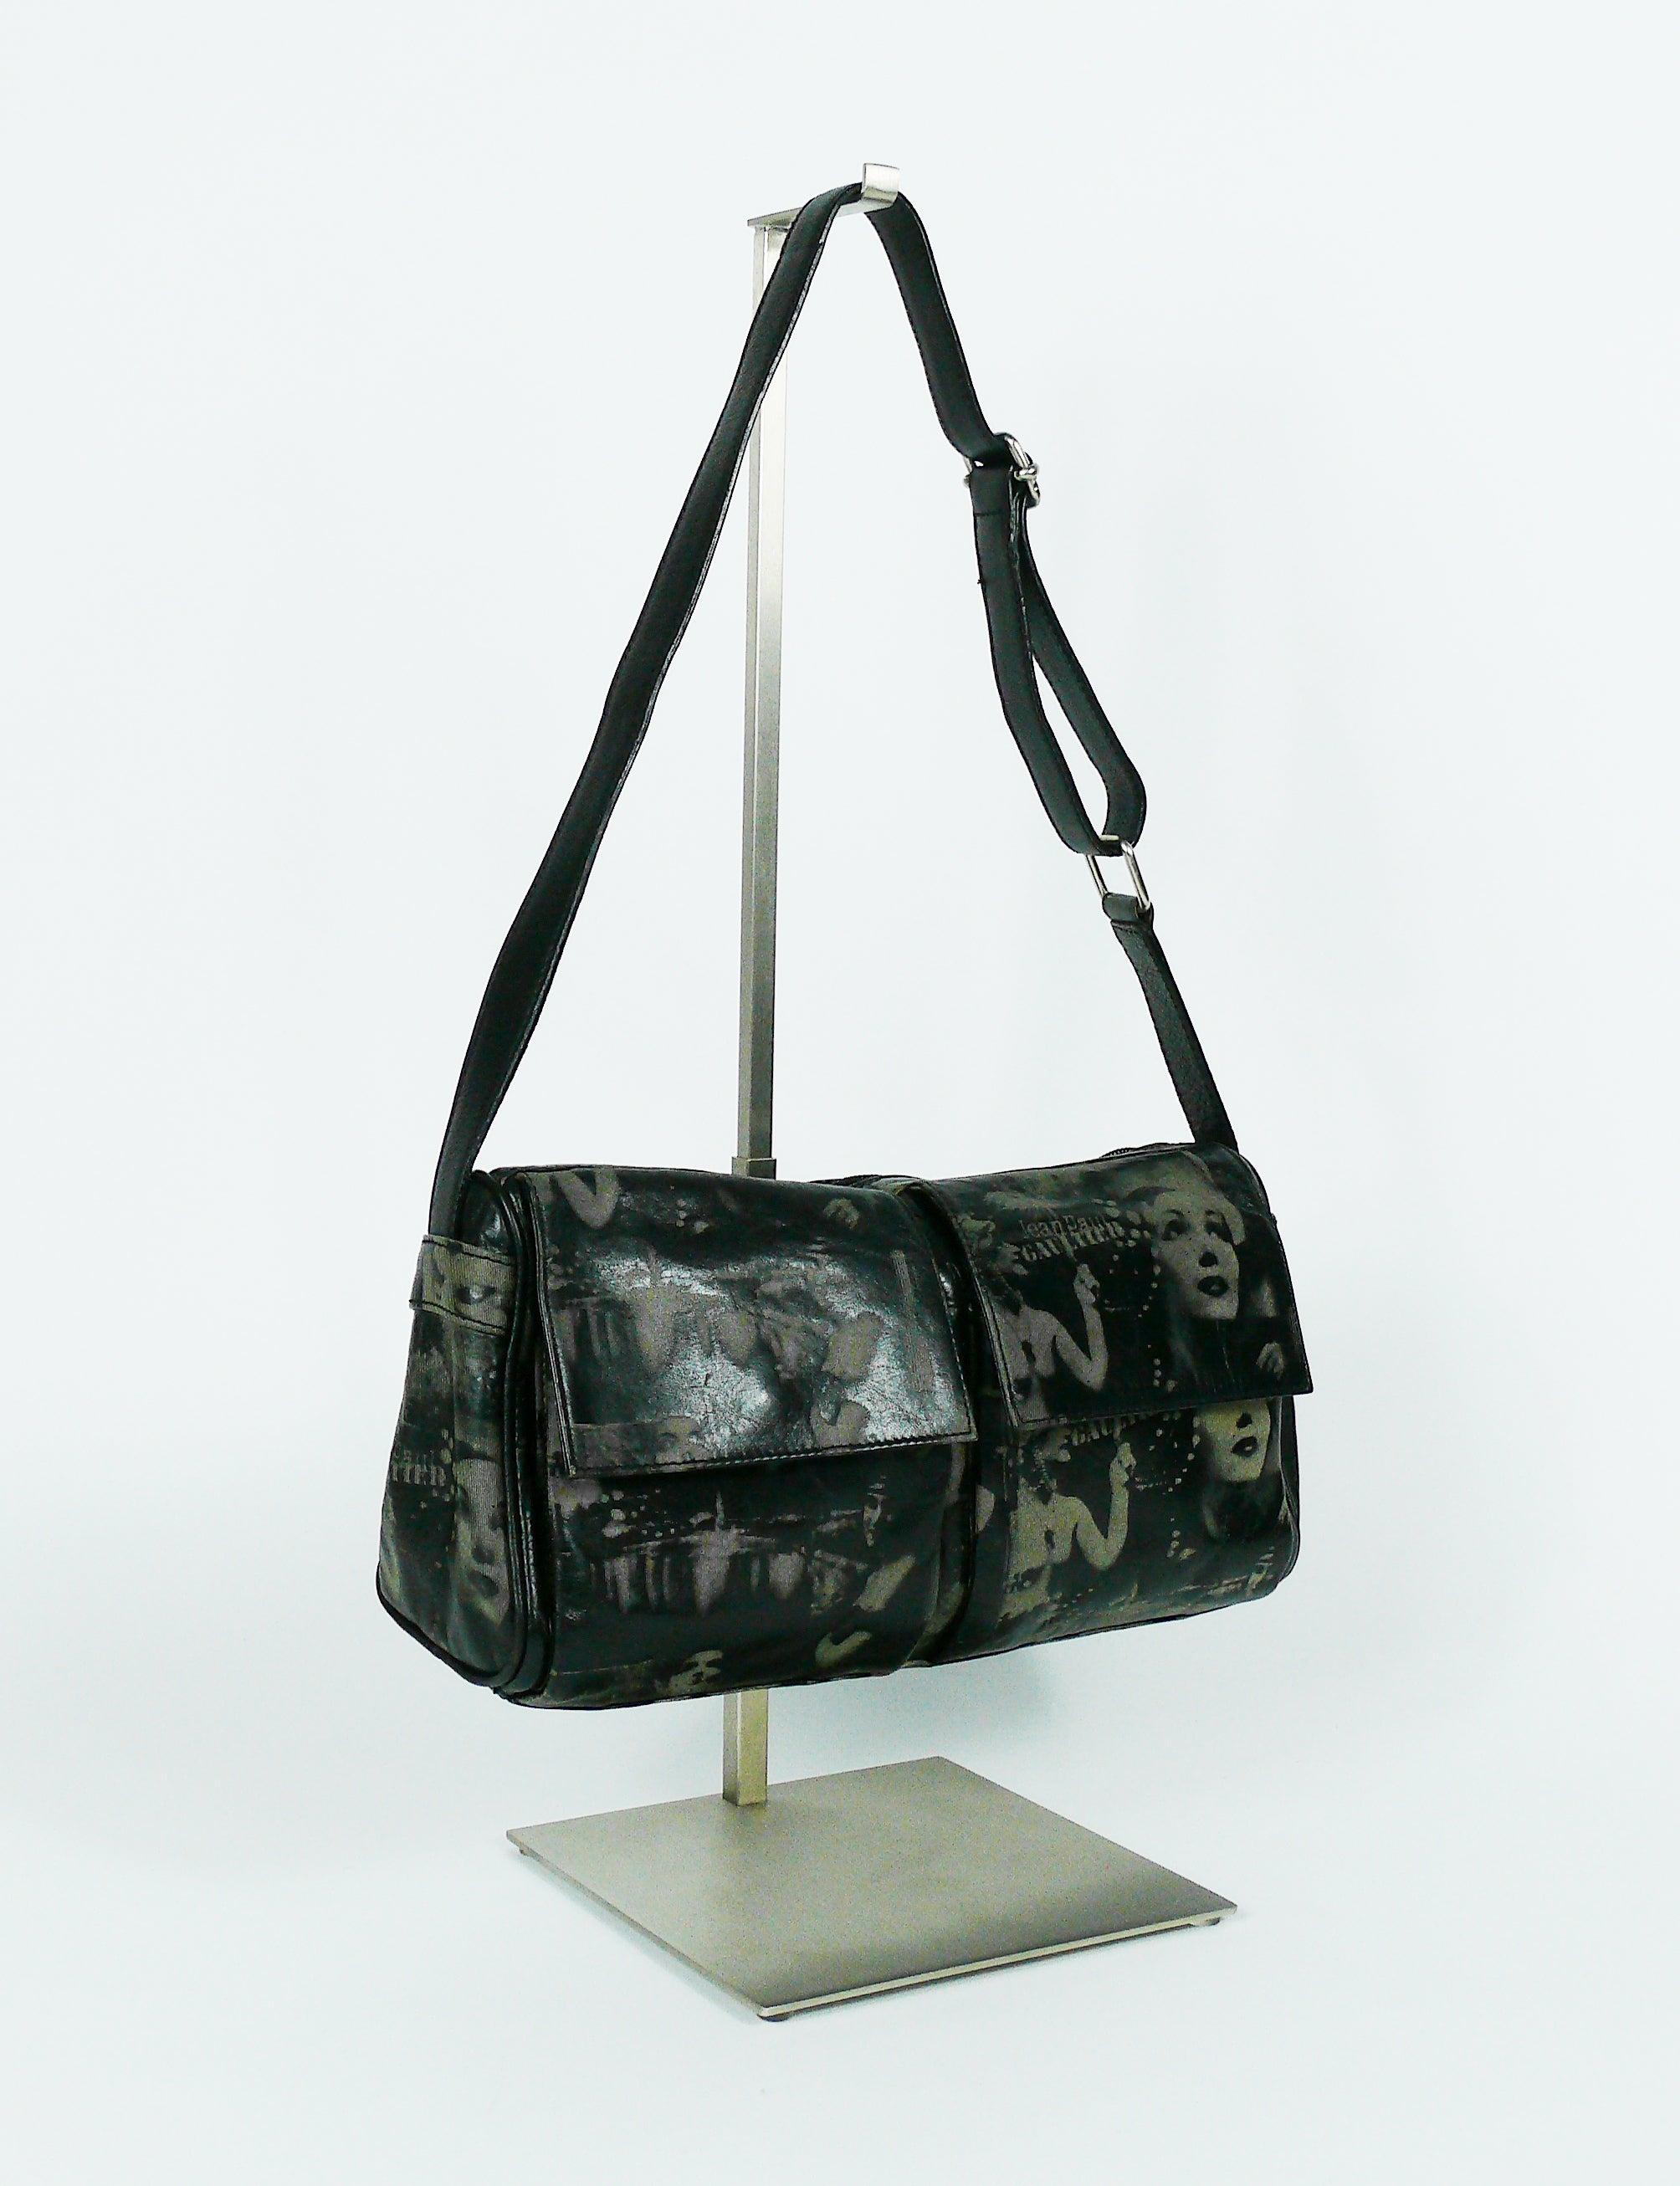 4cc384a515 Jean Paul Gaultier Vintage Retro Dietrich Print Leather Shoulder Bag For  Sale at 1stdibs